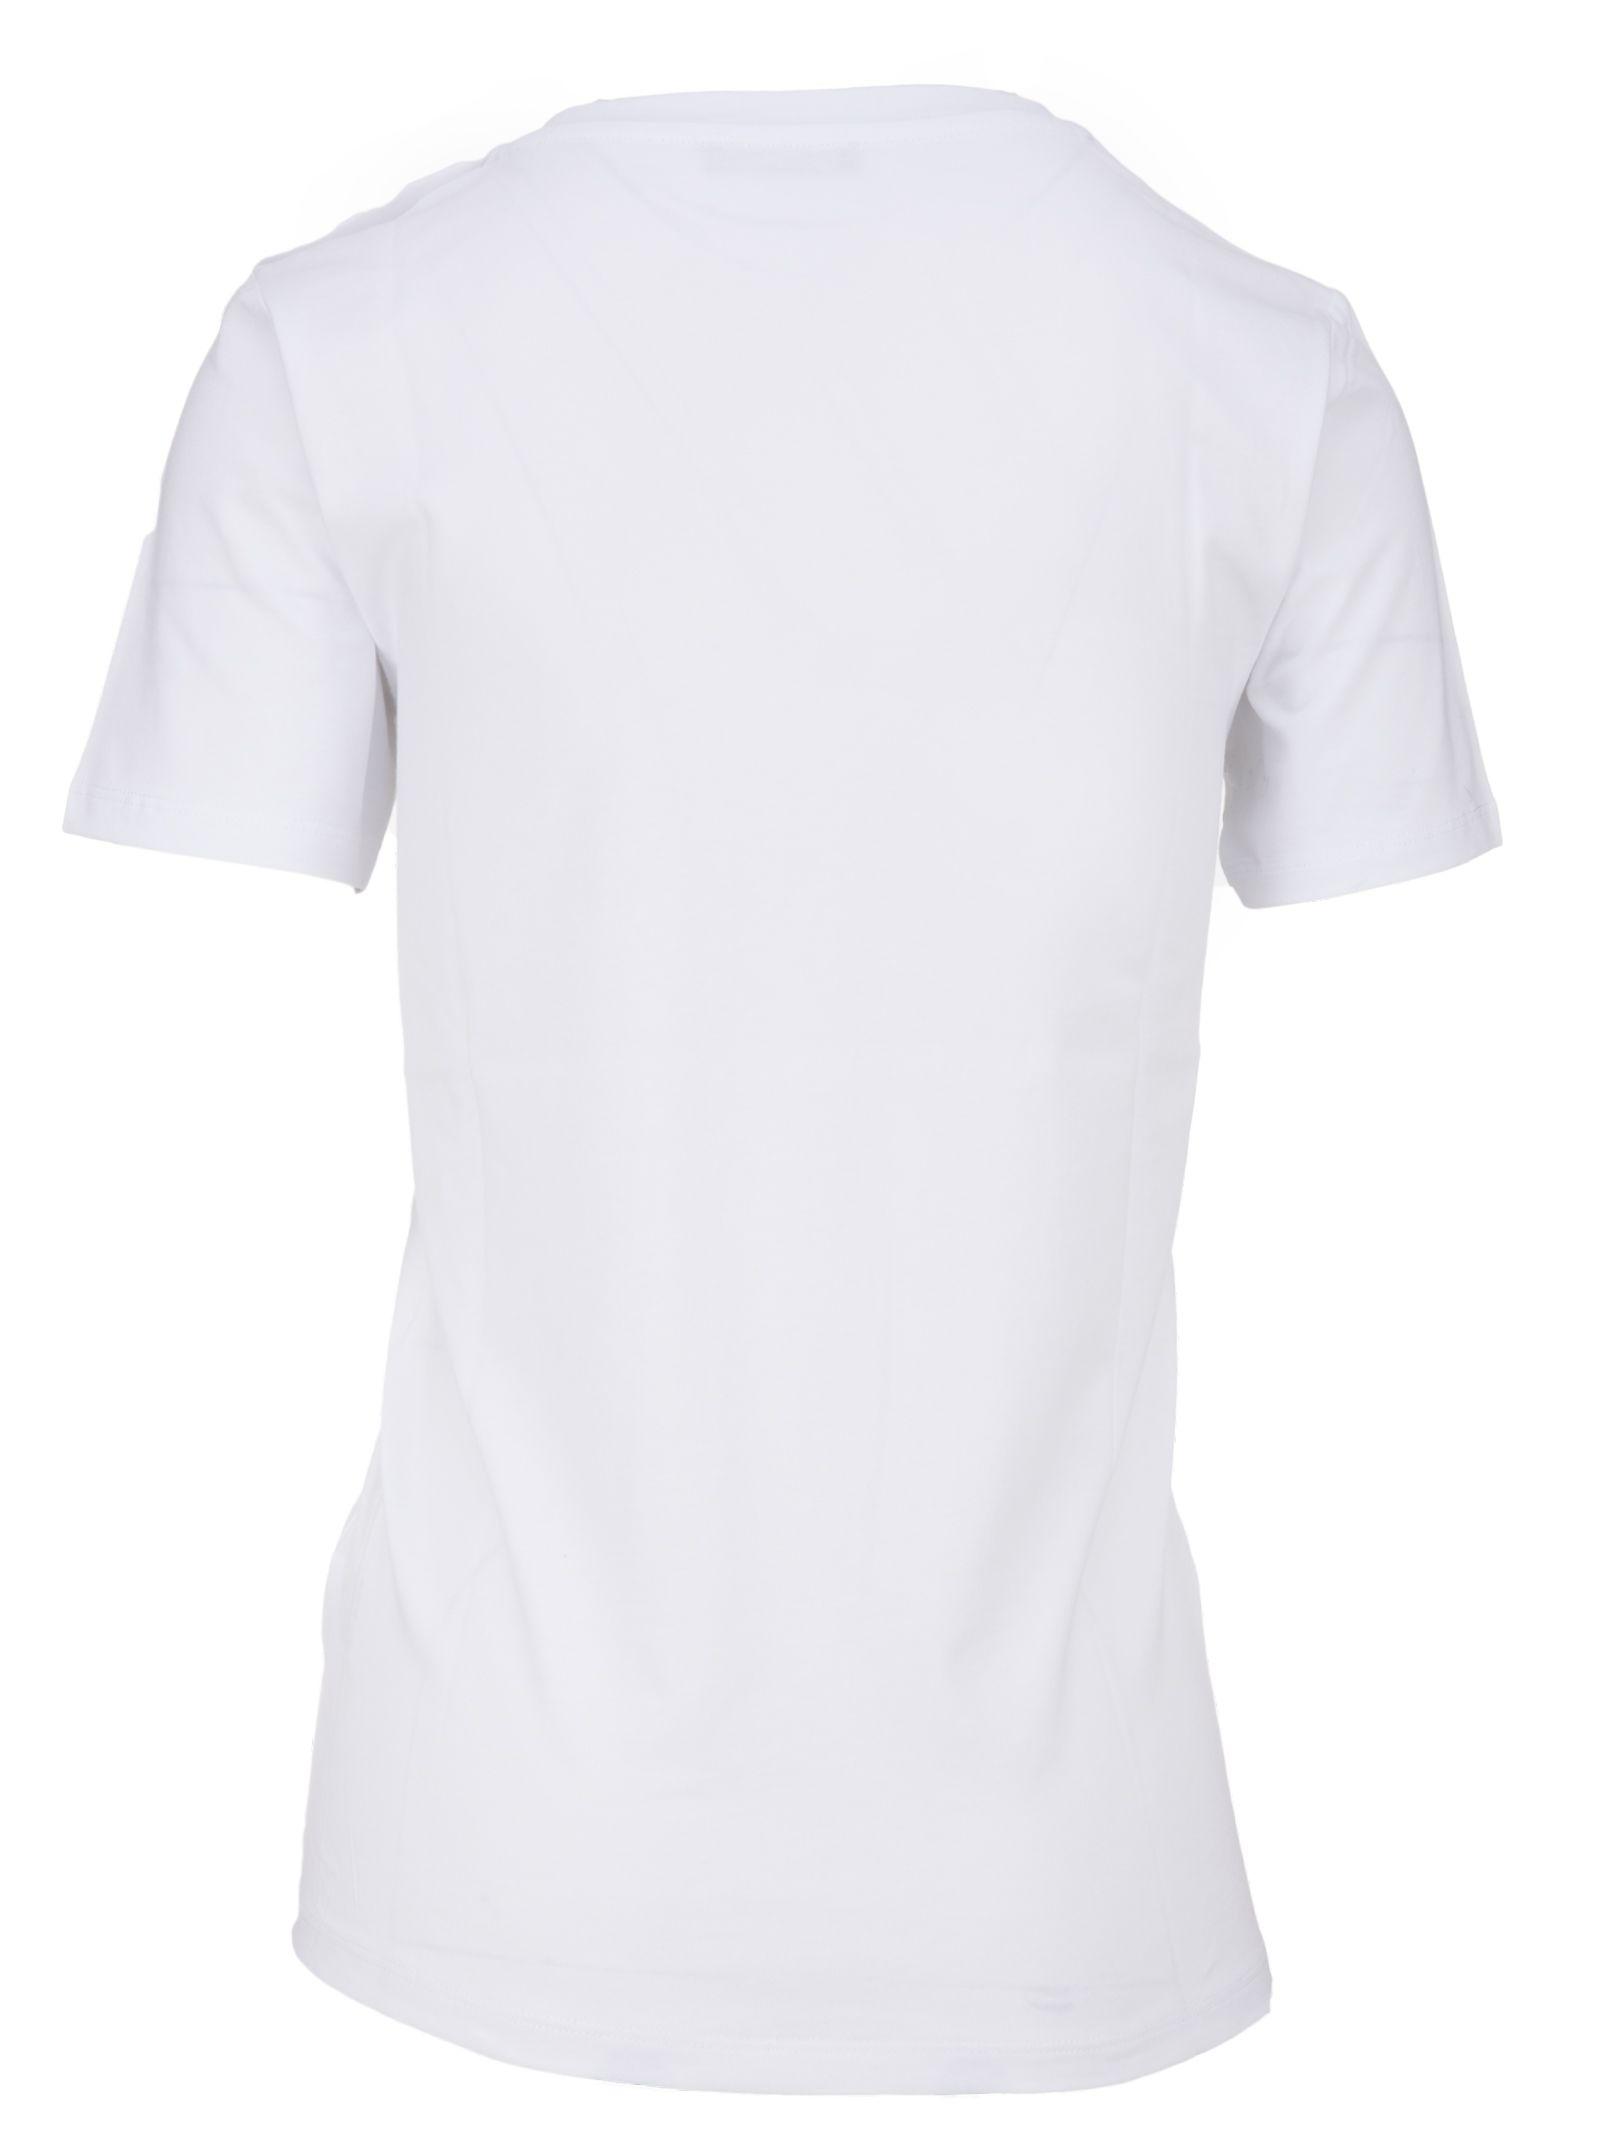 balmain balmain paris t shirt bianco women 39 s short sleeve t shirts italist. Black Bedroom Furniture Sets. Home Design Ideas